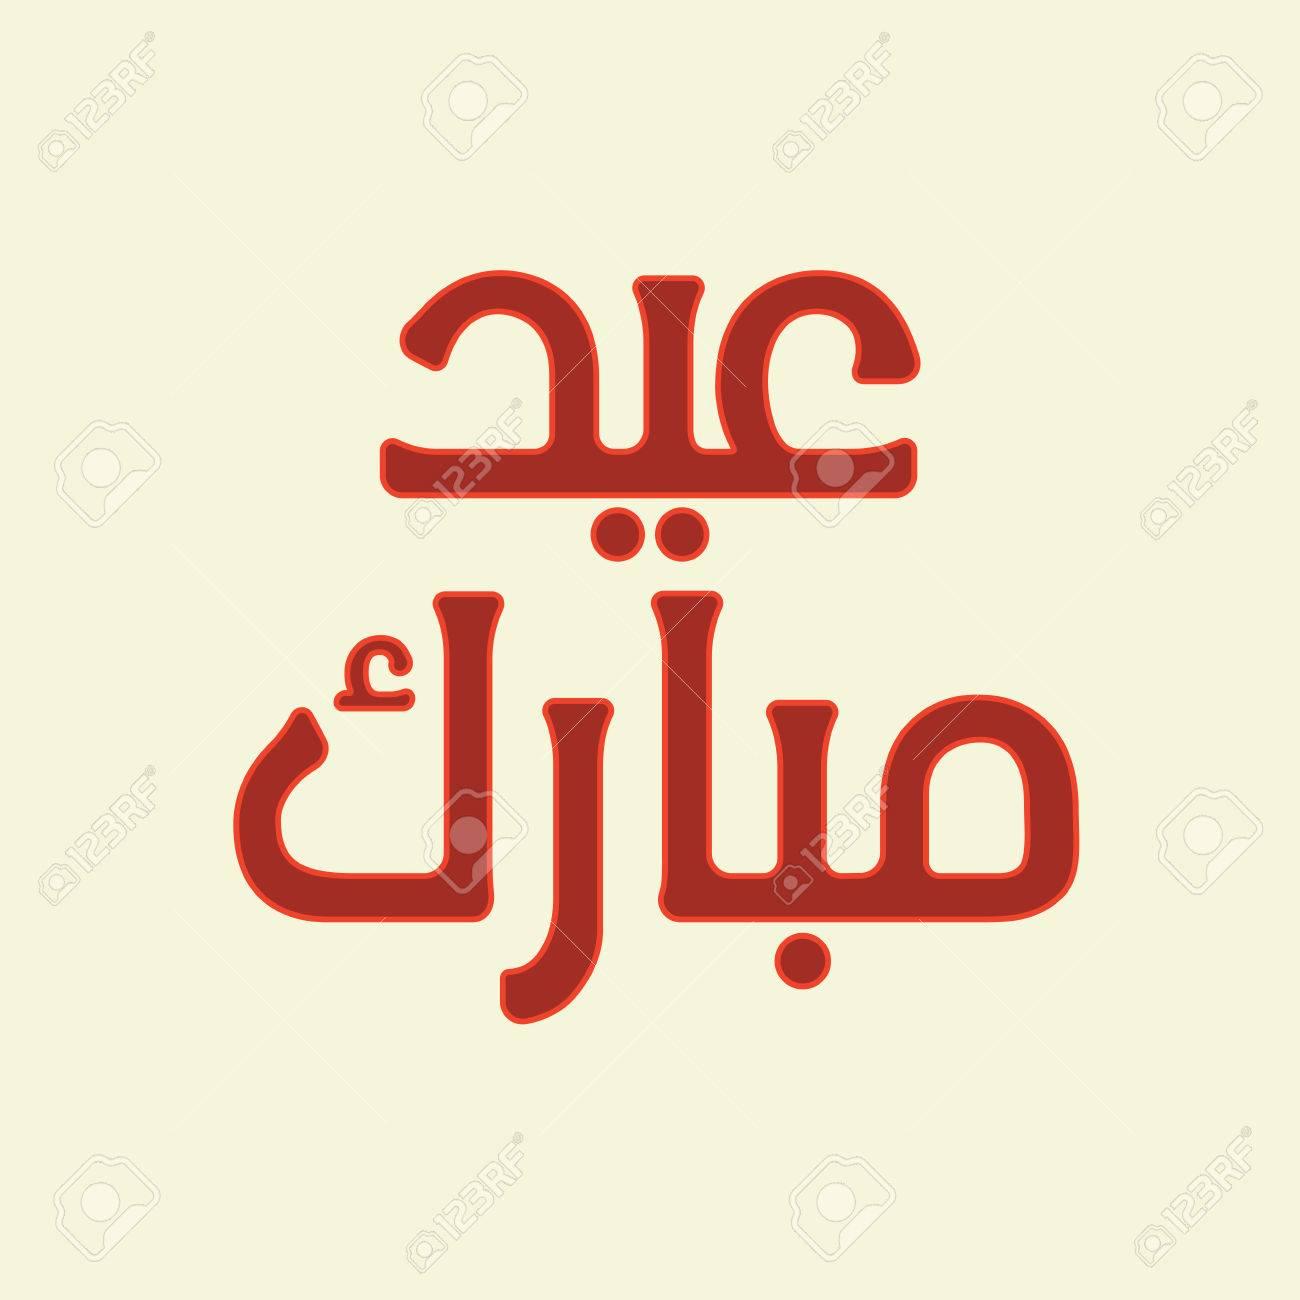 Urdu arabic islamic calligraphy of text eid mubarak for muslim urdu arabic islamic calligraphy of text eid mubarak for muslim community festival celebrations stock vector m4hsunfo